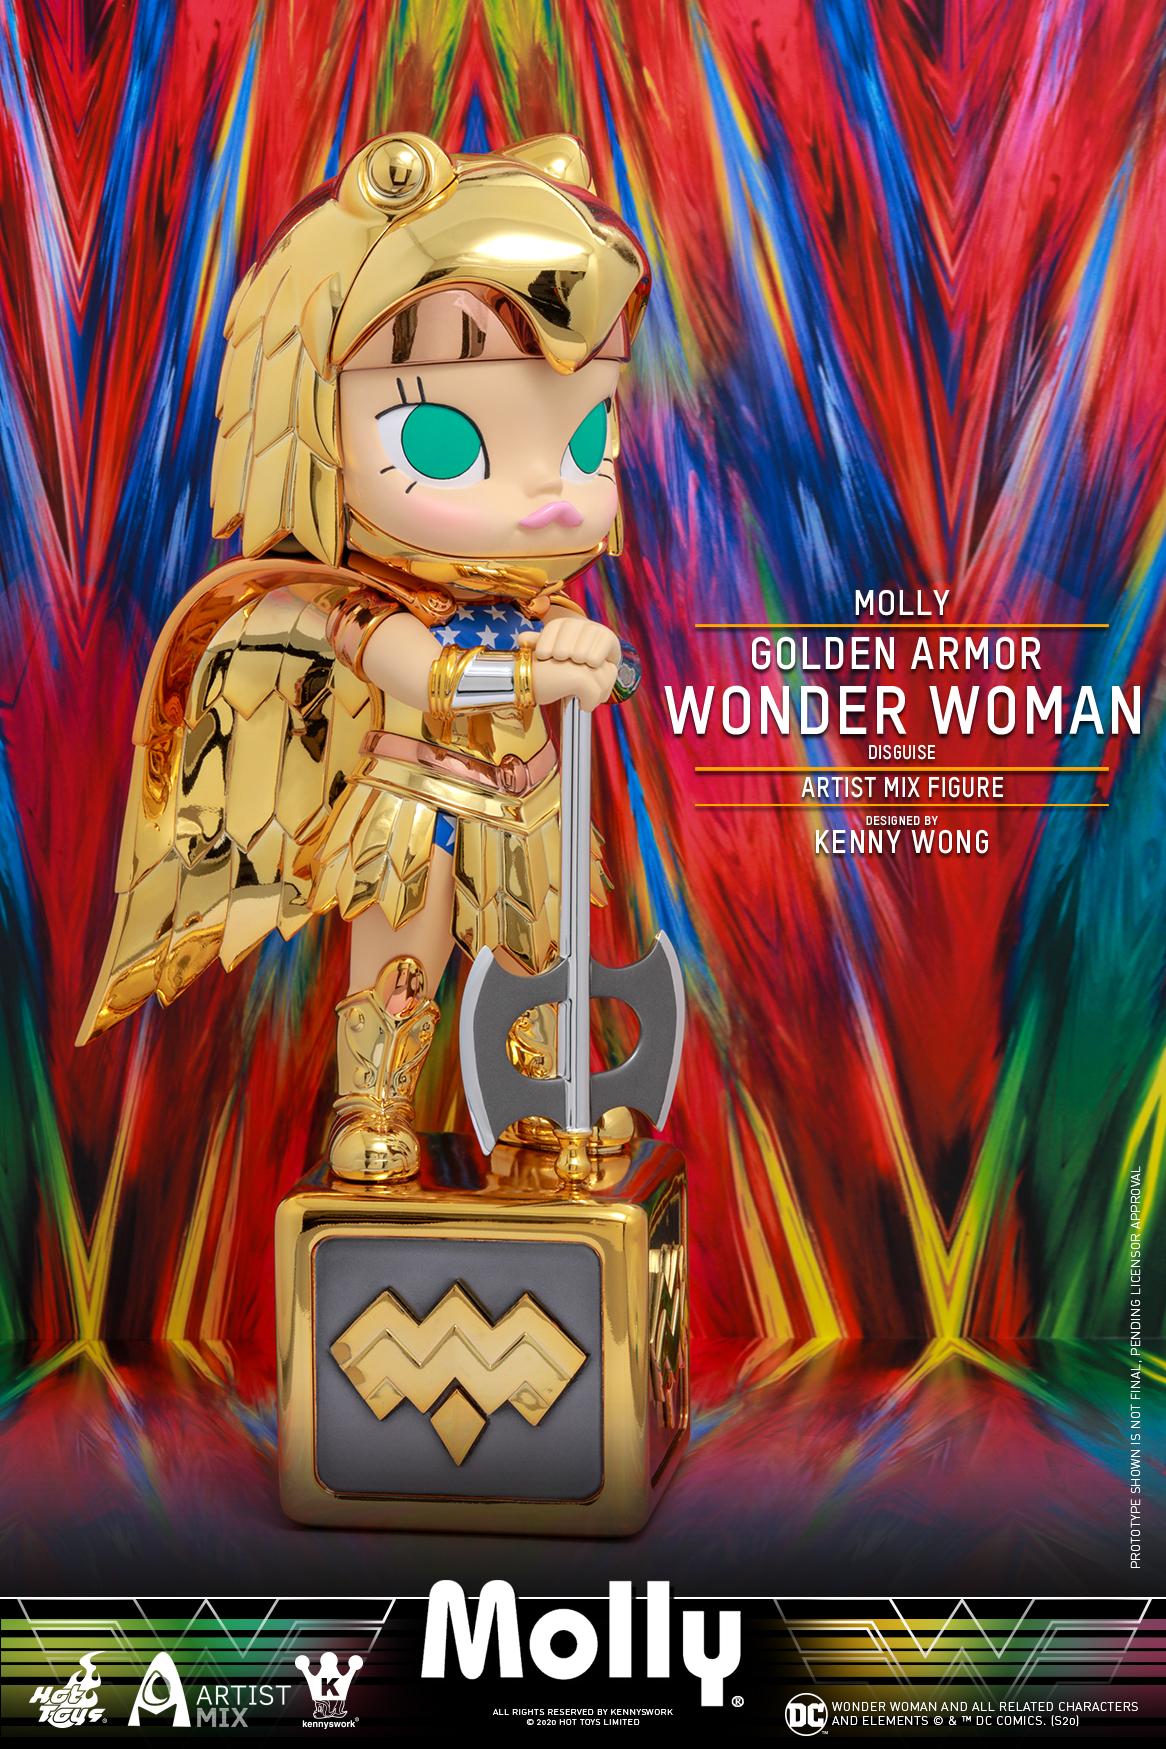 Hot Toys - Molly (Golden Armor Wonder Woman Disguise) Artist Mix Figure_PR3